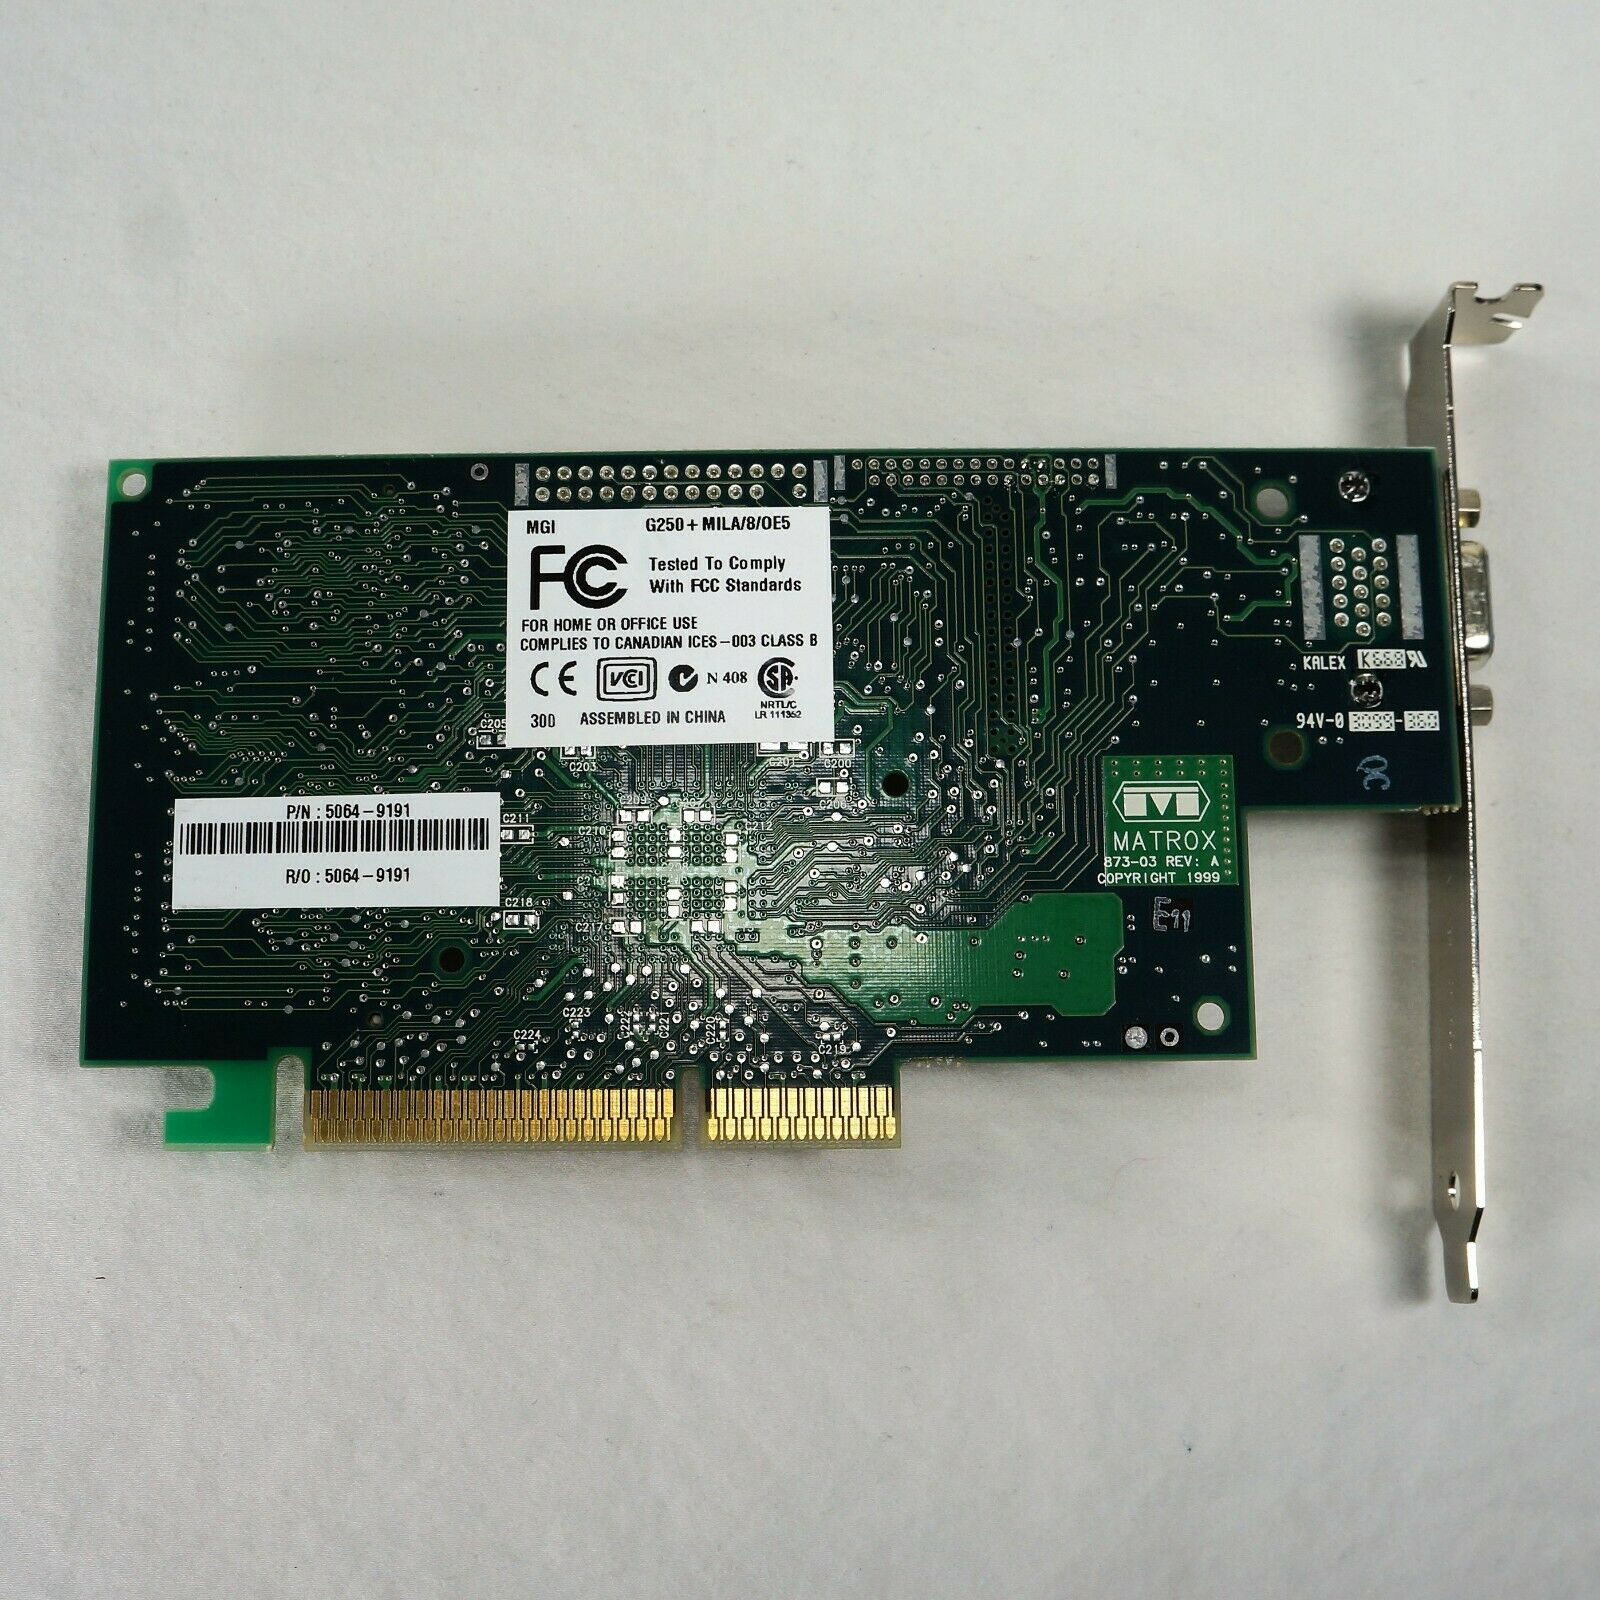 Matrox HP 873-03 5064-9191 AGP VGA Video Card NEW